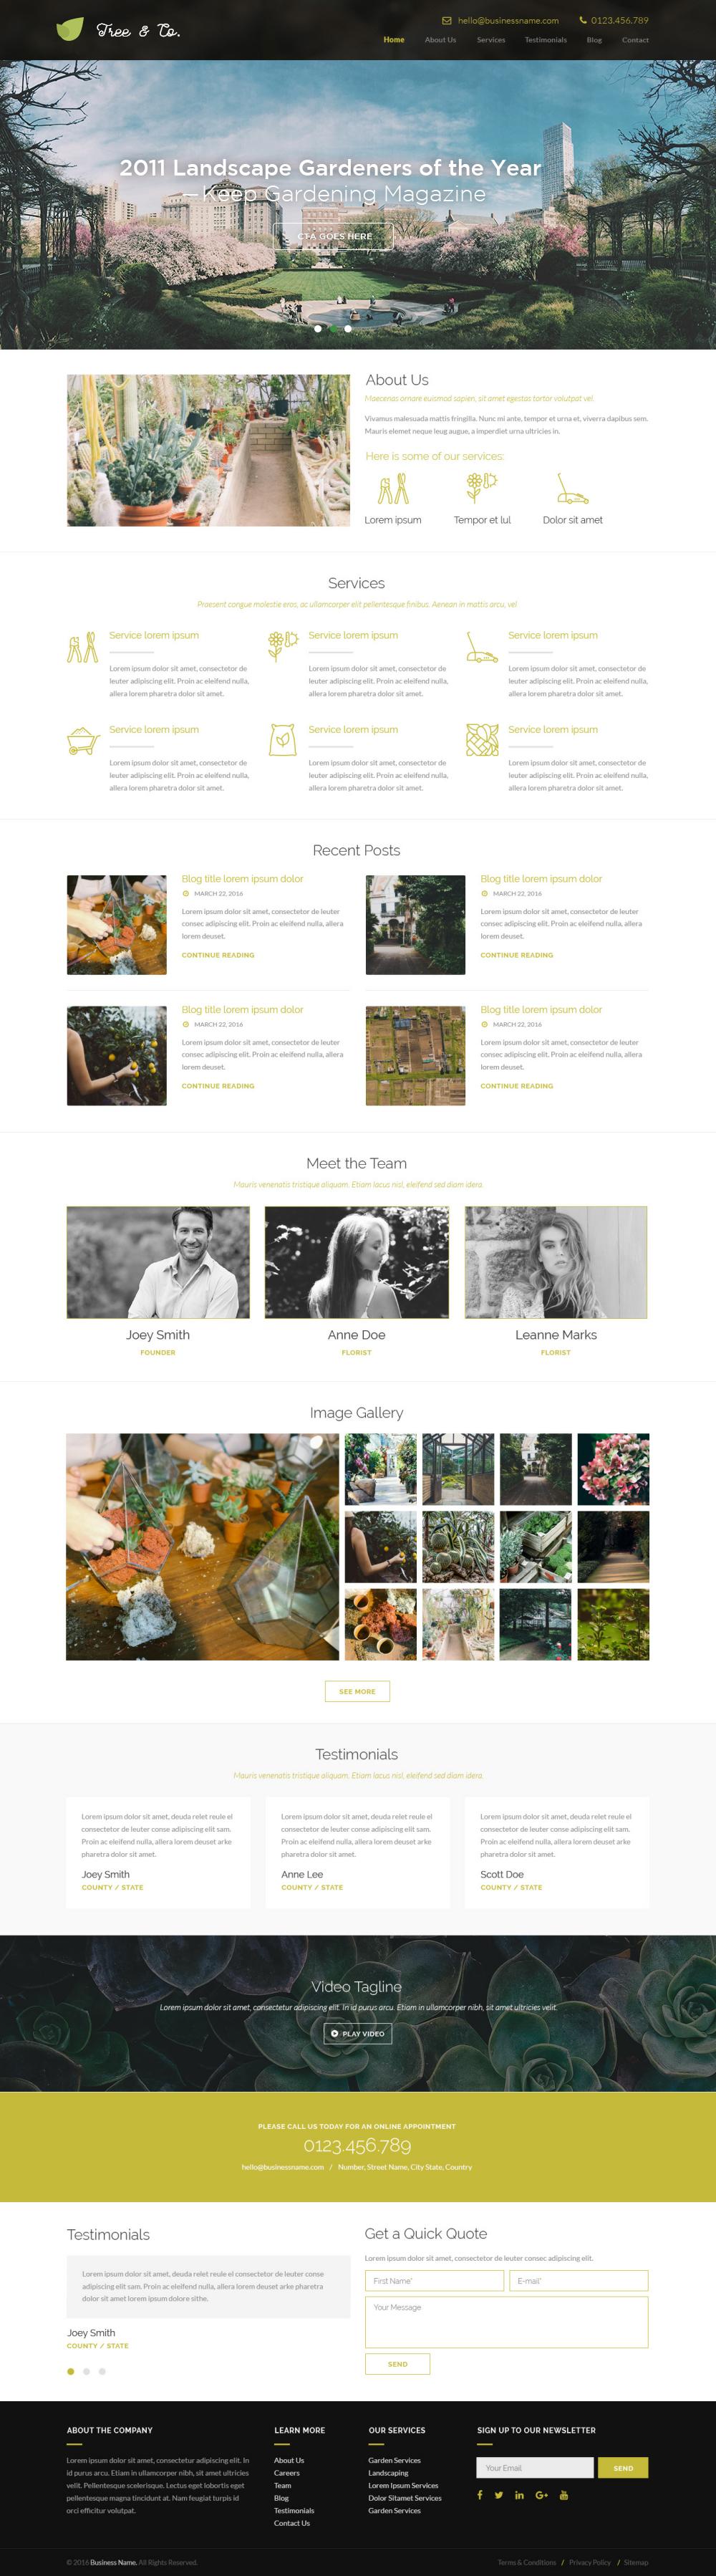 Gardening 4 - Landscaping / Gardening Website Design